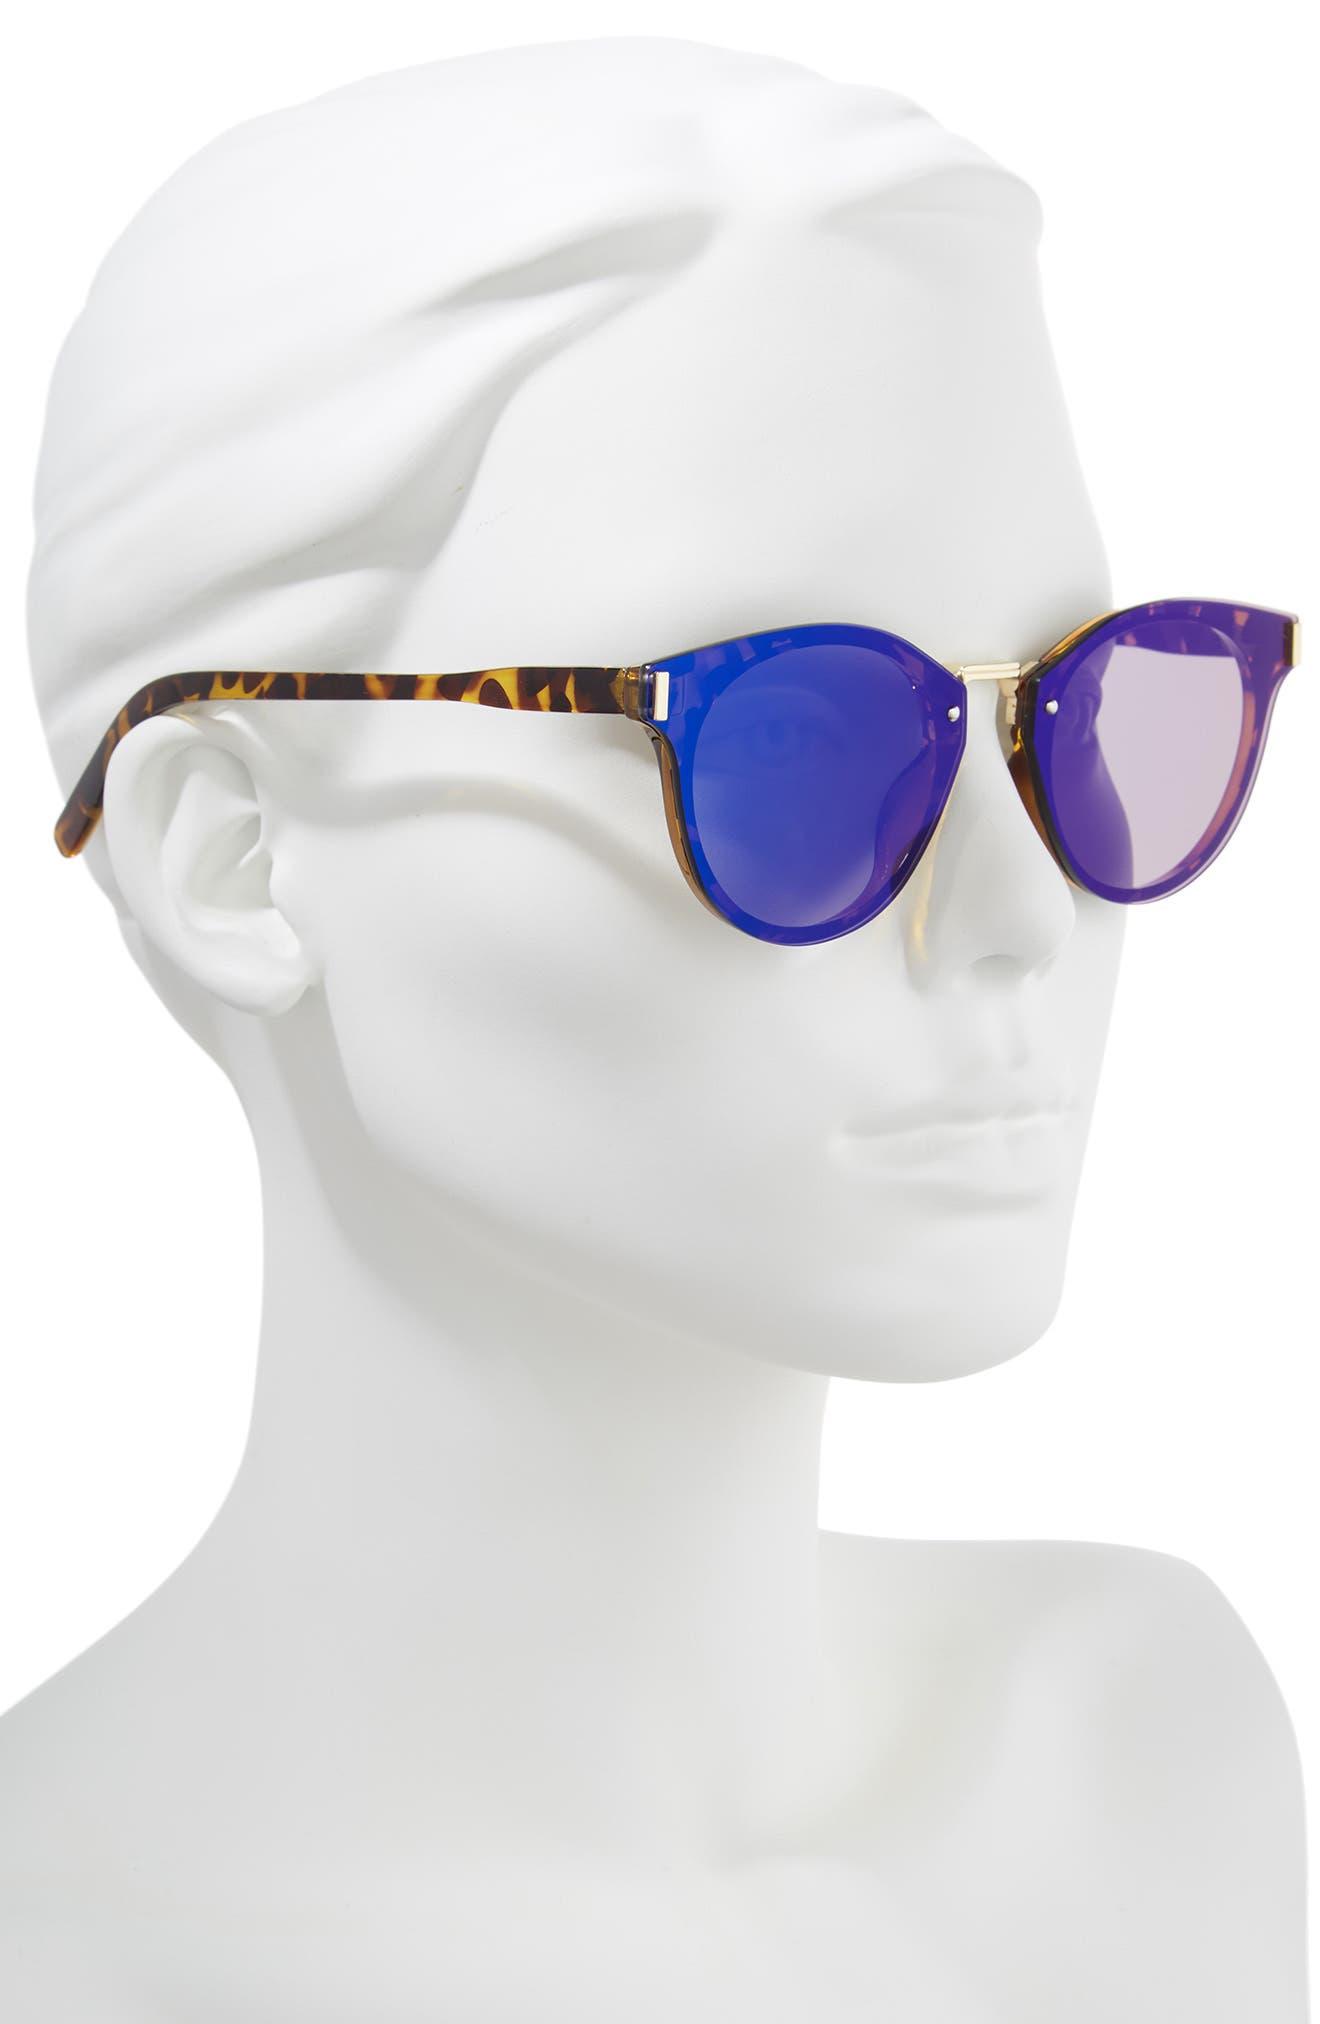 Flat Cat Eye Sunglasses,                             Alternate thumbnail 2, color,                             200